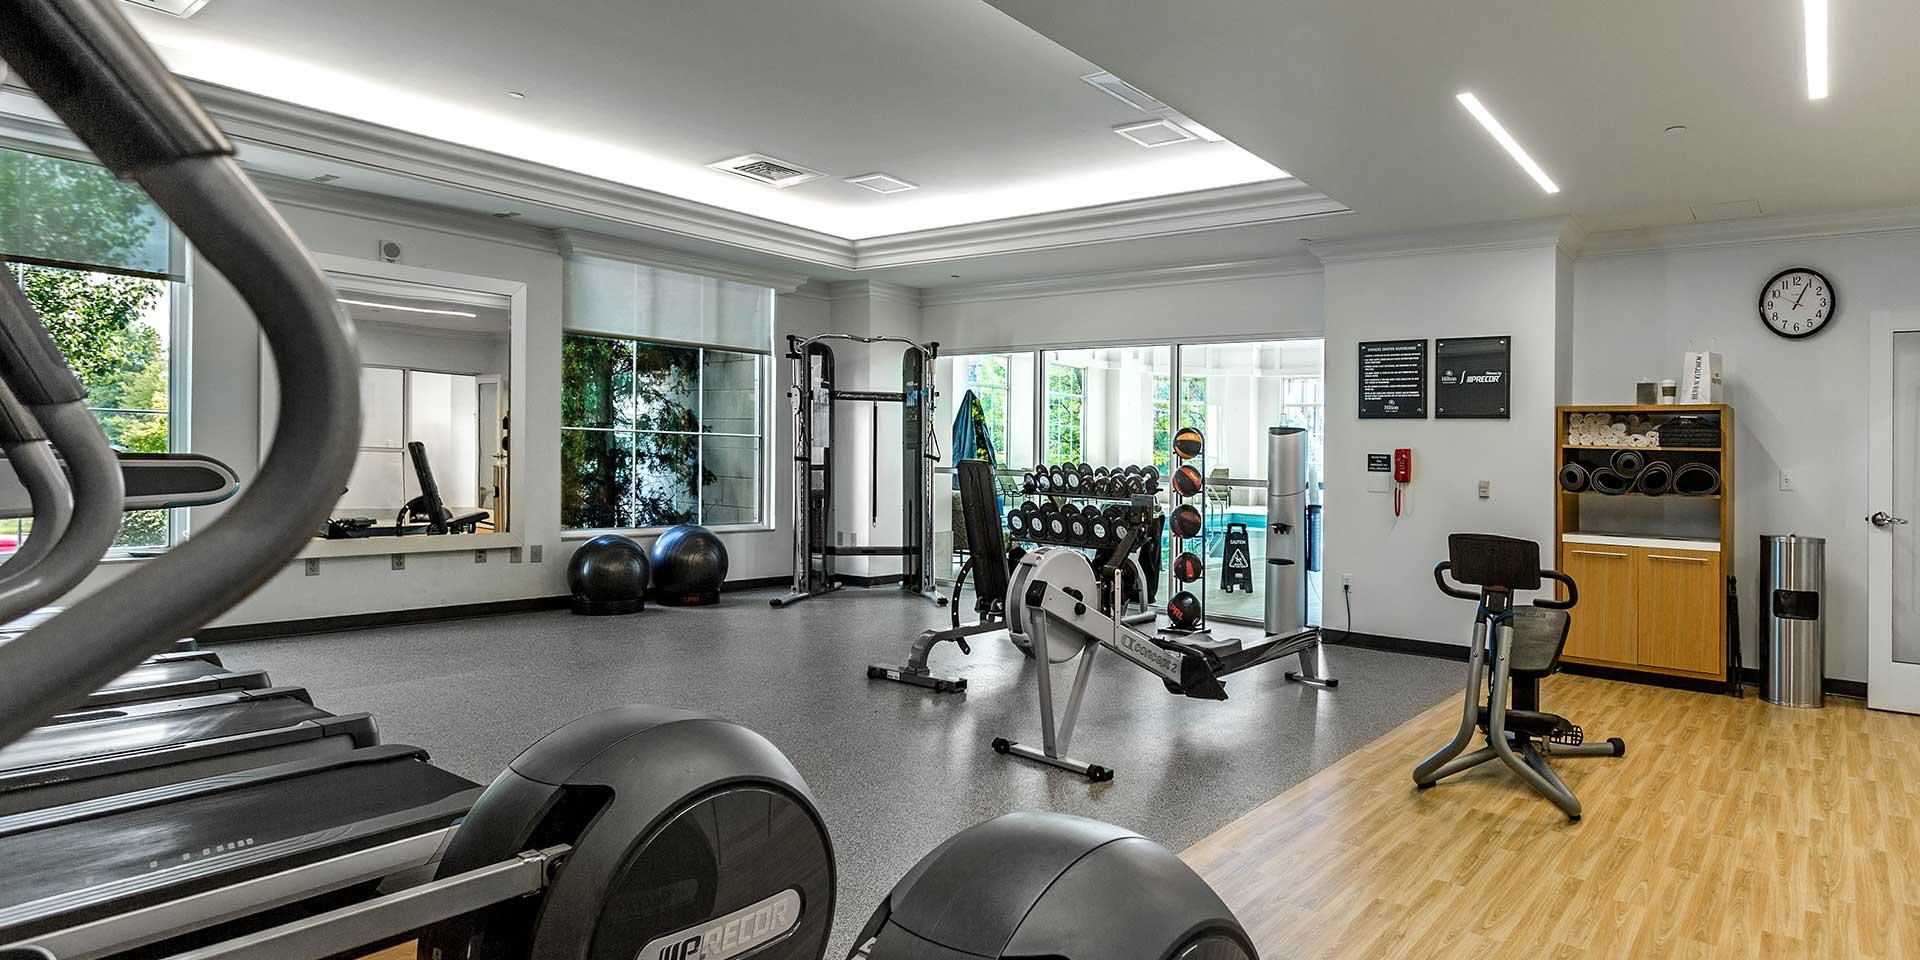 Columbus ohio hotel fitness centerhilton columbus at easton